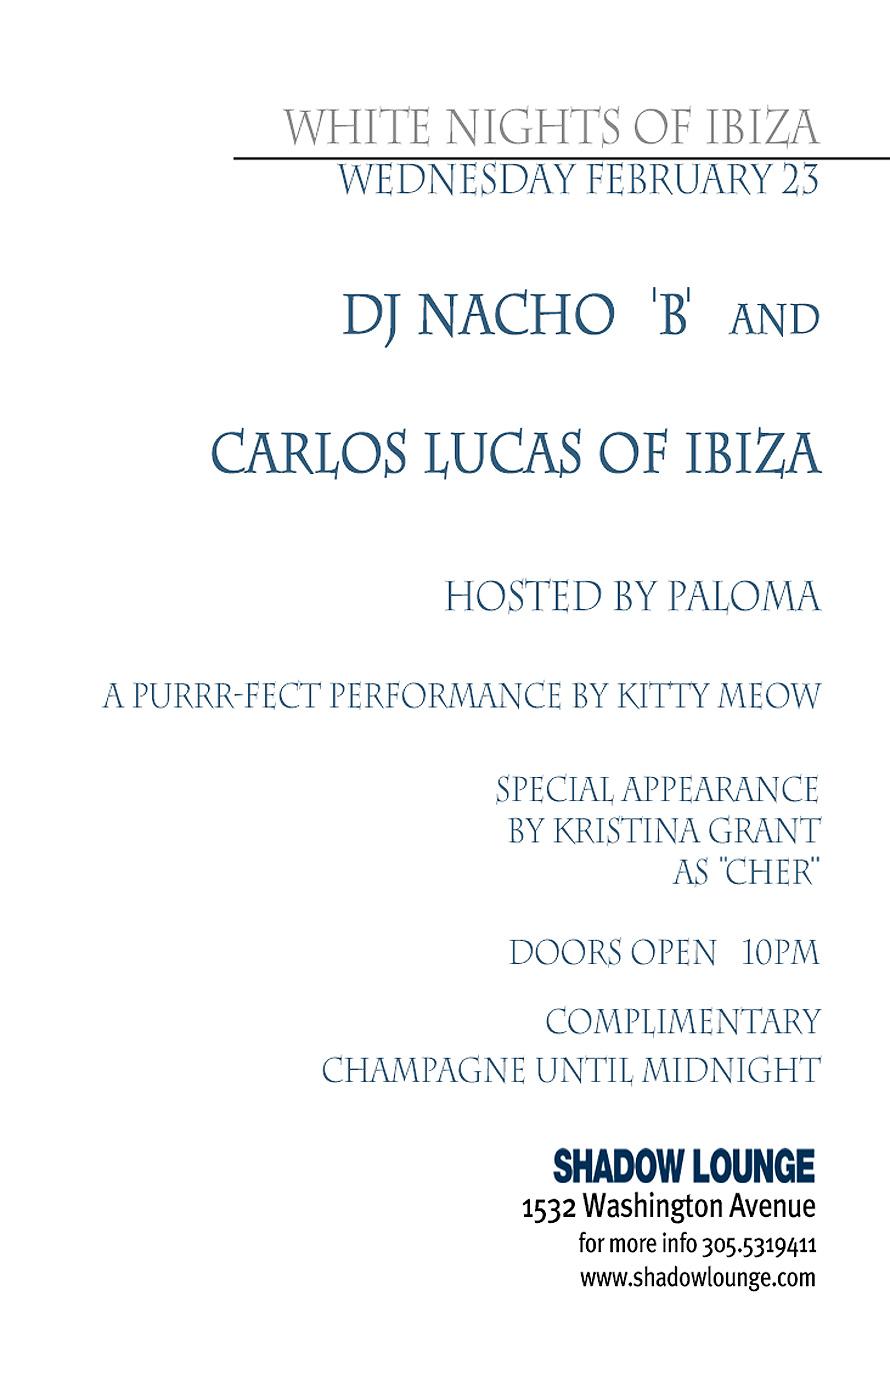 White Nights of Ibiza at Shadow Lounge